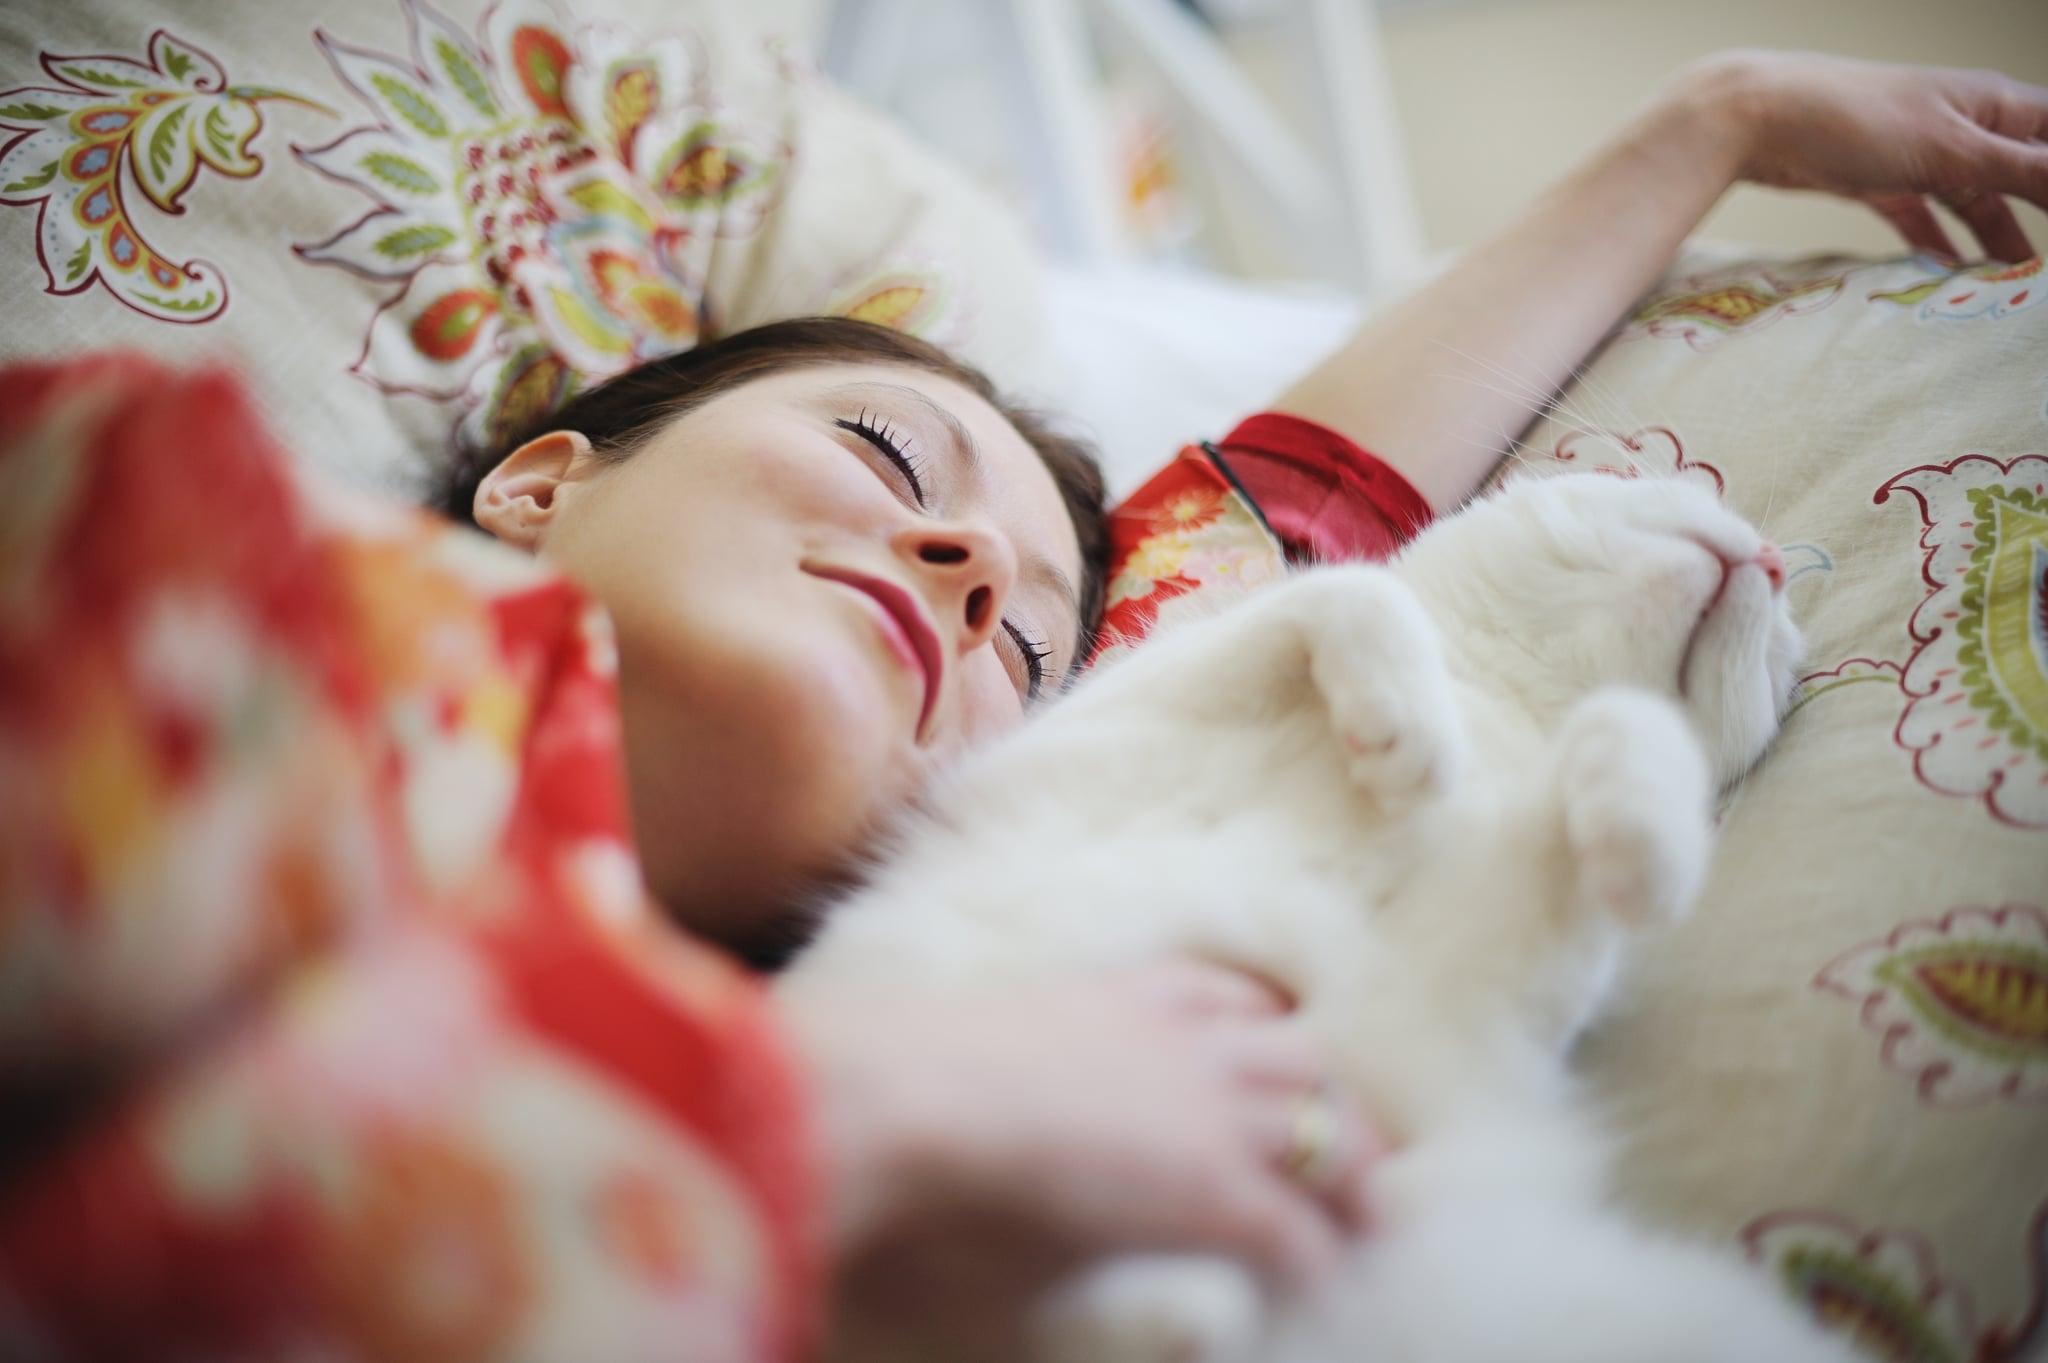 Smiling woman wearing  kimono, in bed, asleep next to white cat.